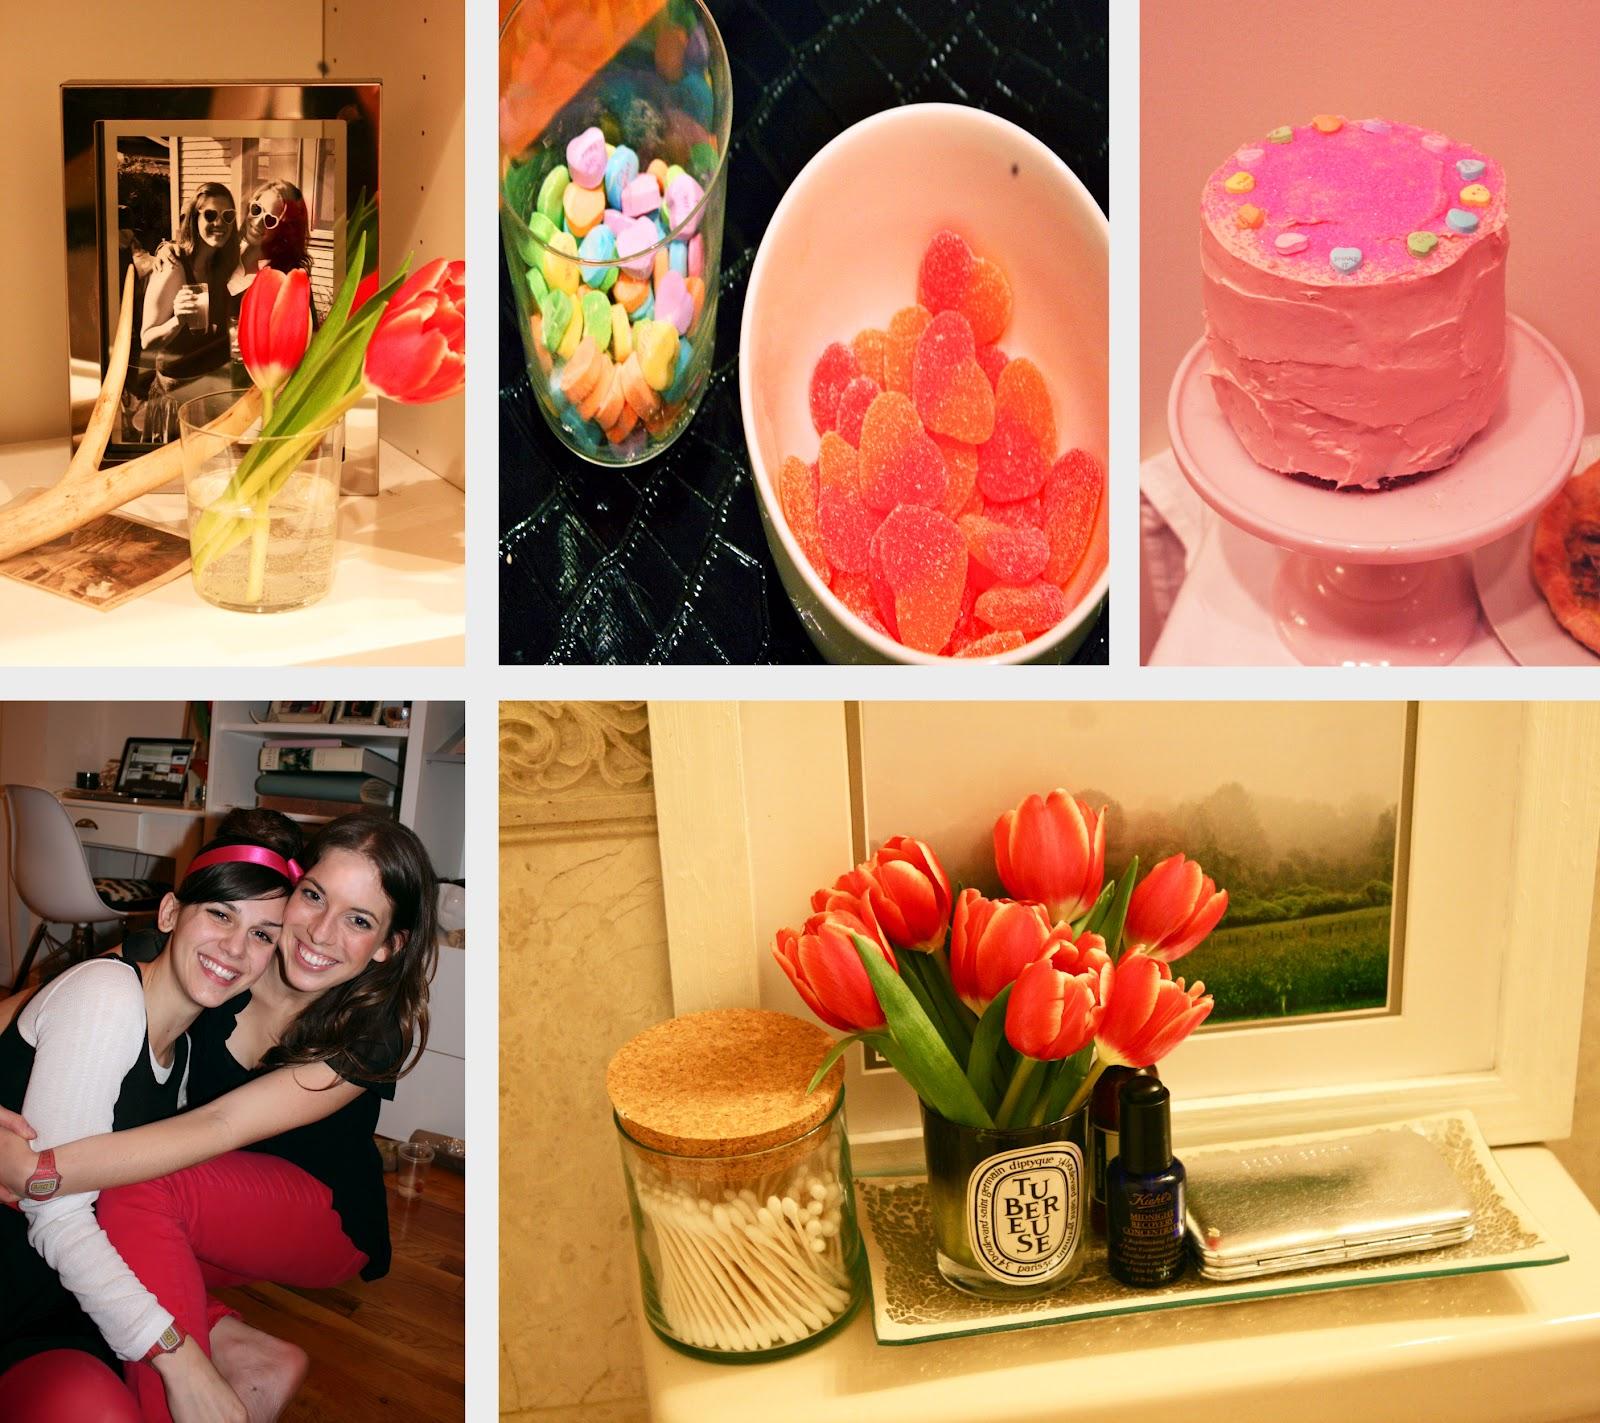 Cheesy Love Song Party— Happy Valentine's Day! / Hey, EEP